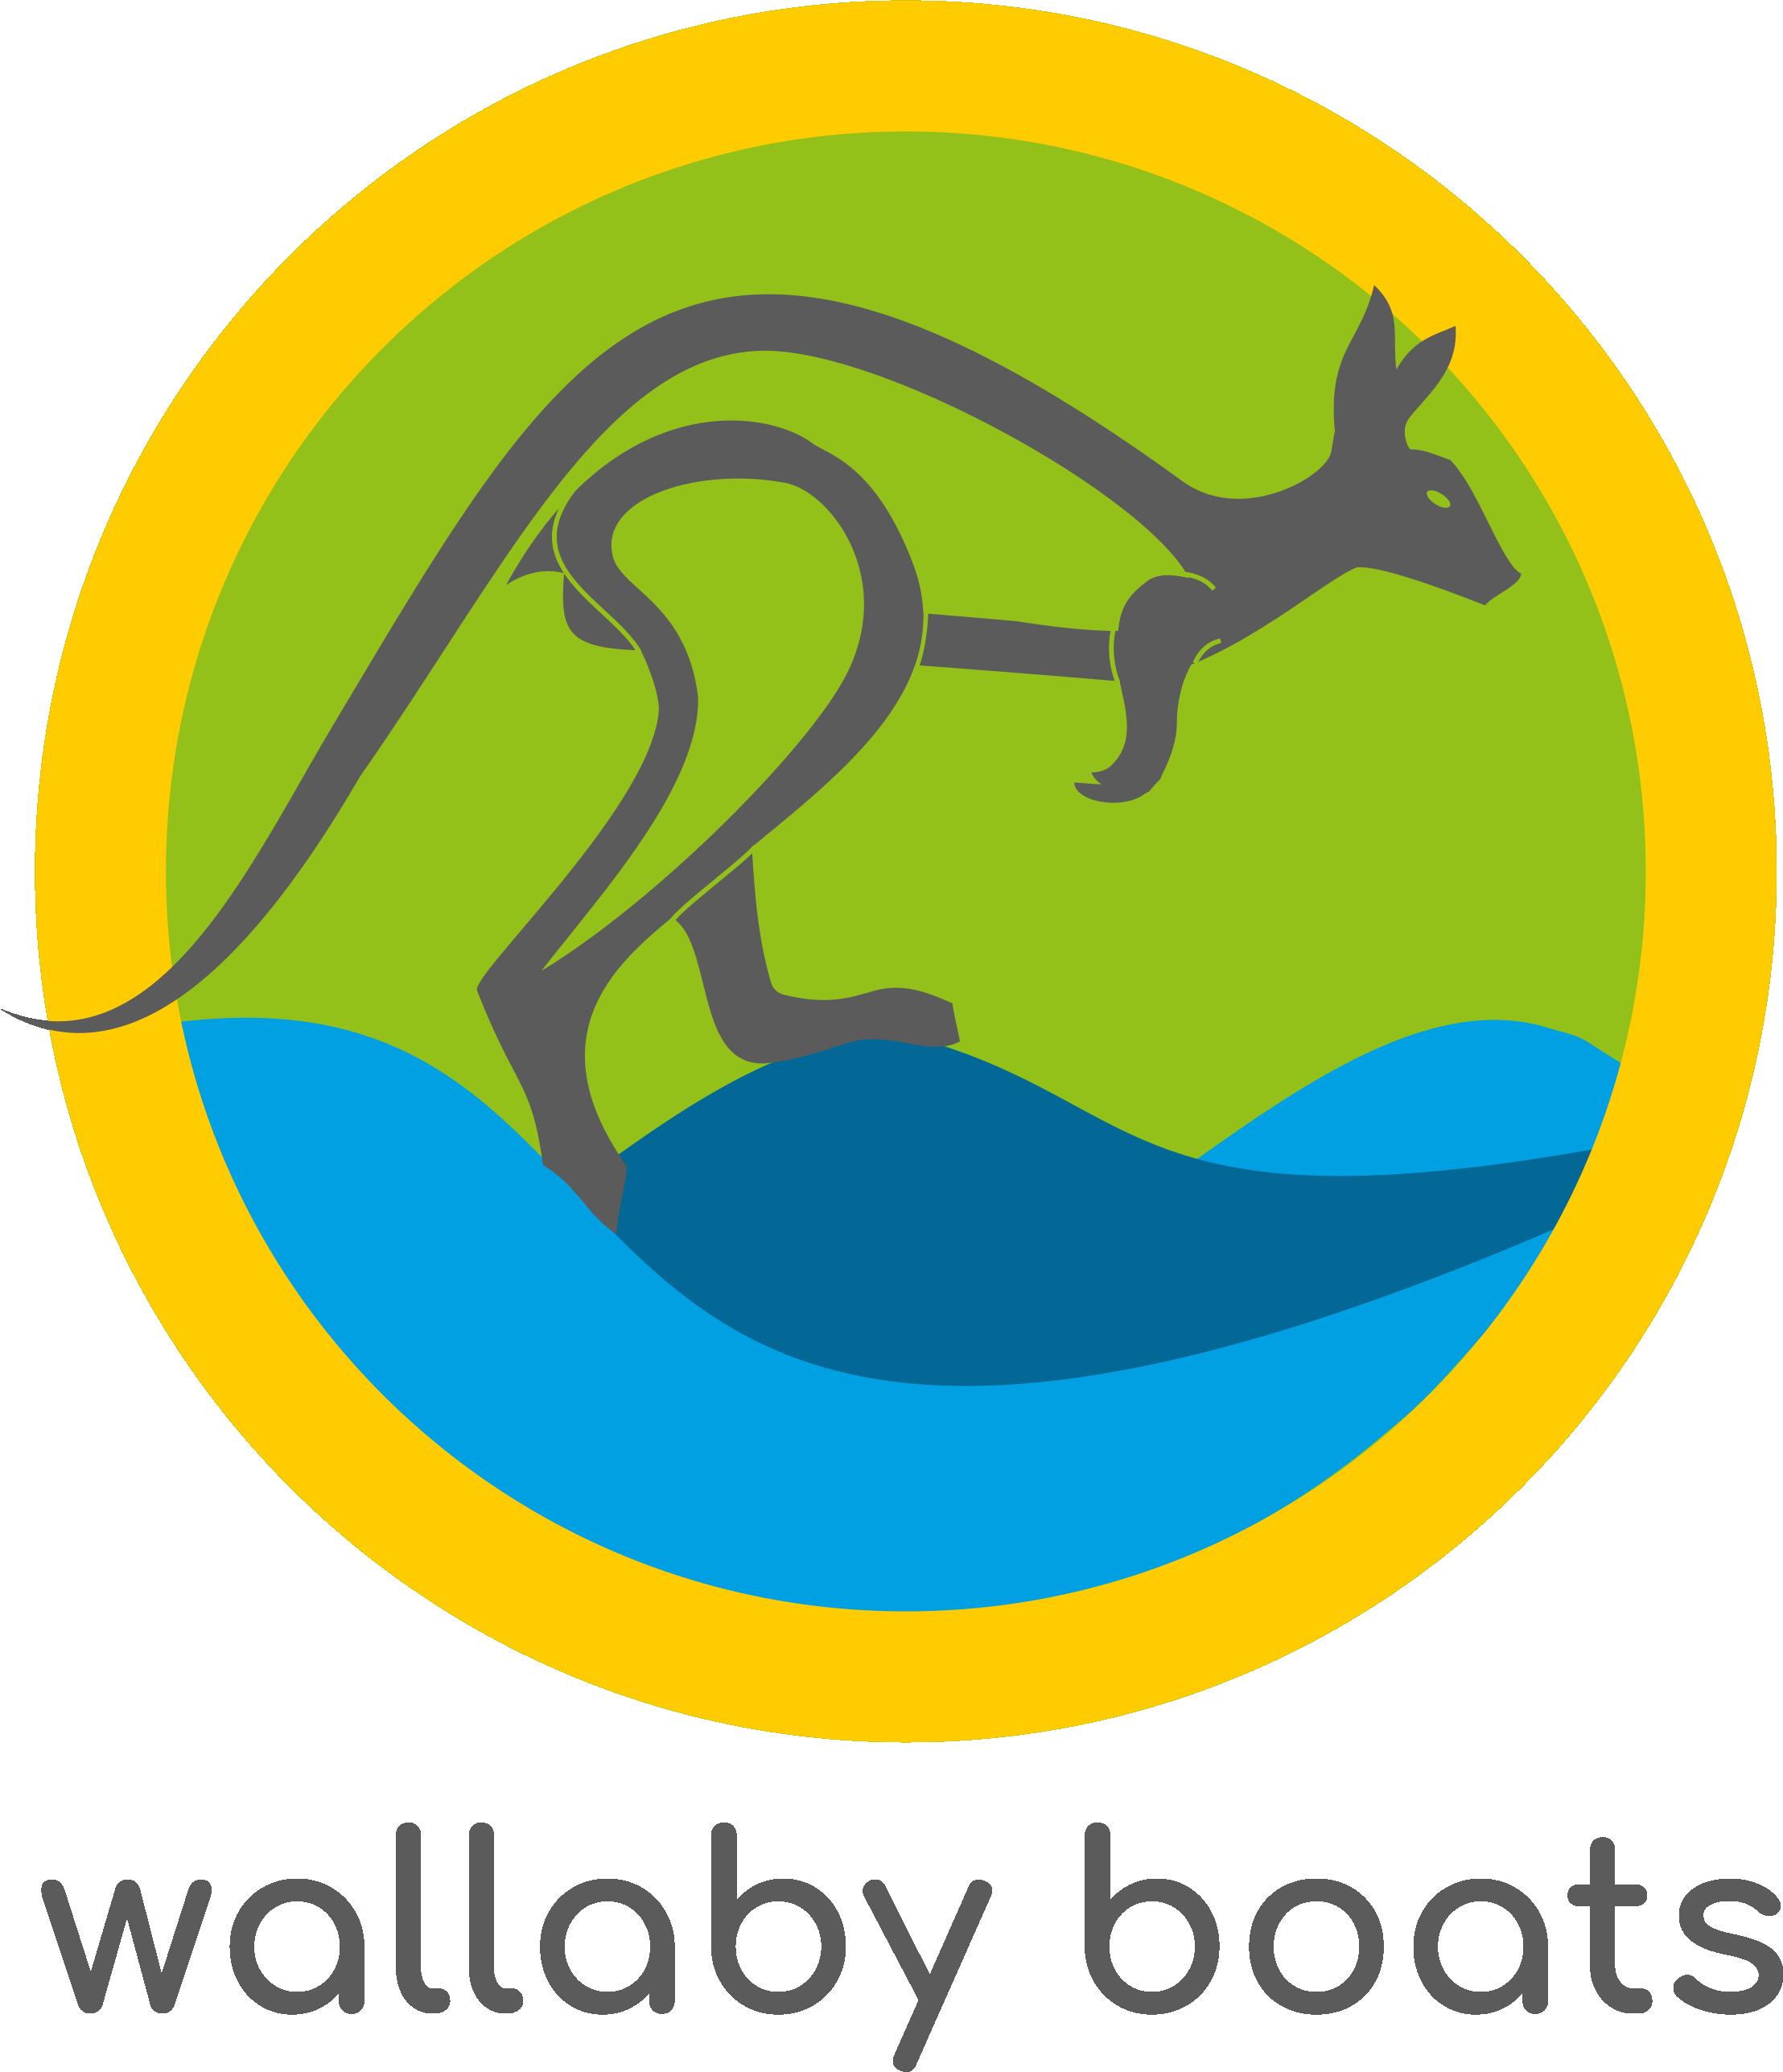 Wallaby Boats GmbH